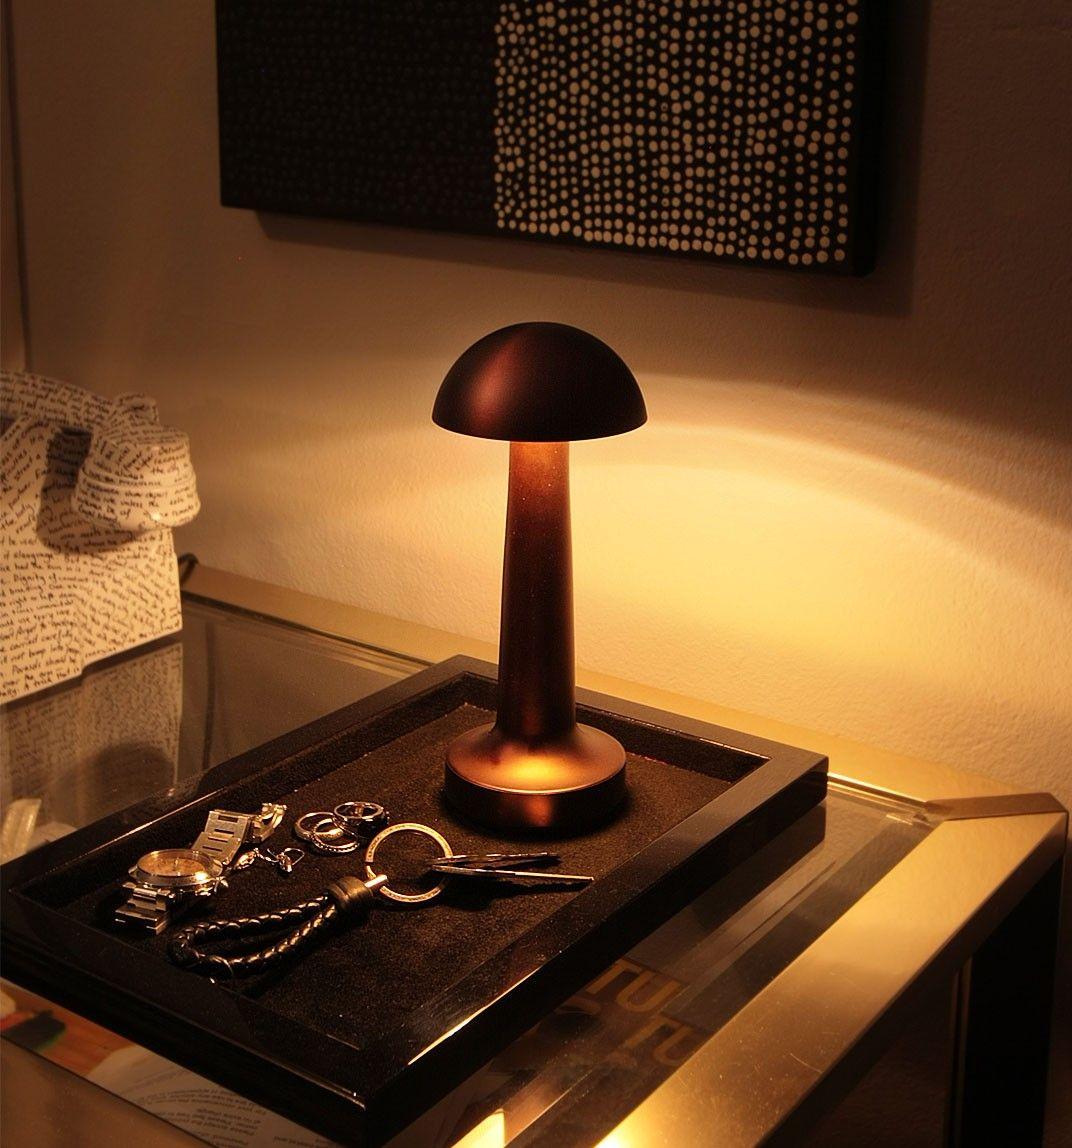 Www Neoz Com Neoz Cordless Lamp cooee 1   cordless lamp   neoz lighting